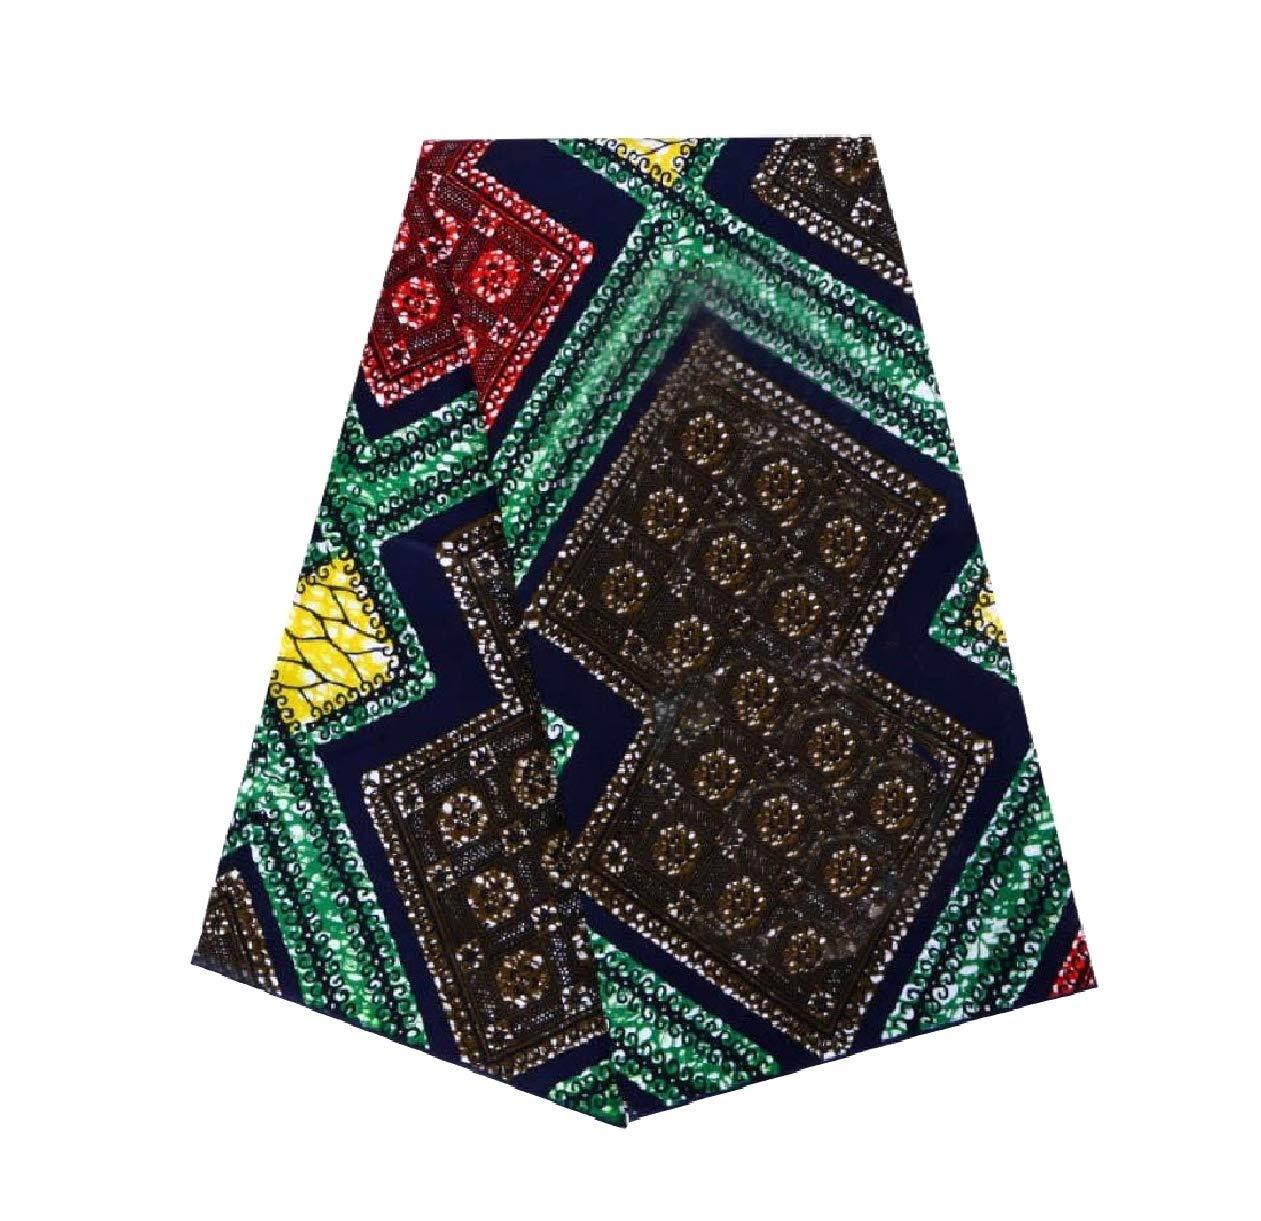 Tootless Men Back Cotton Dashiki Comfy African Printed Apparel Fabric Multi OS